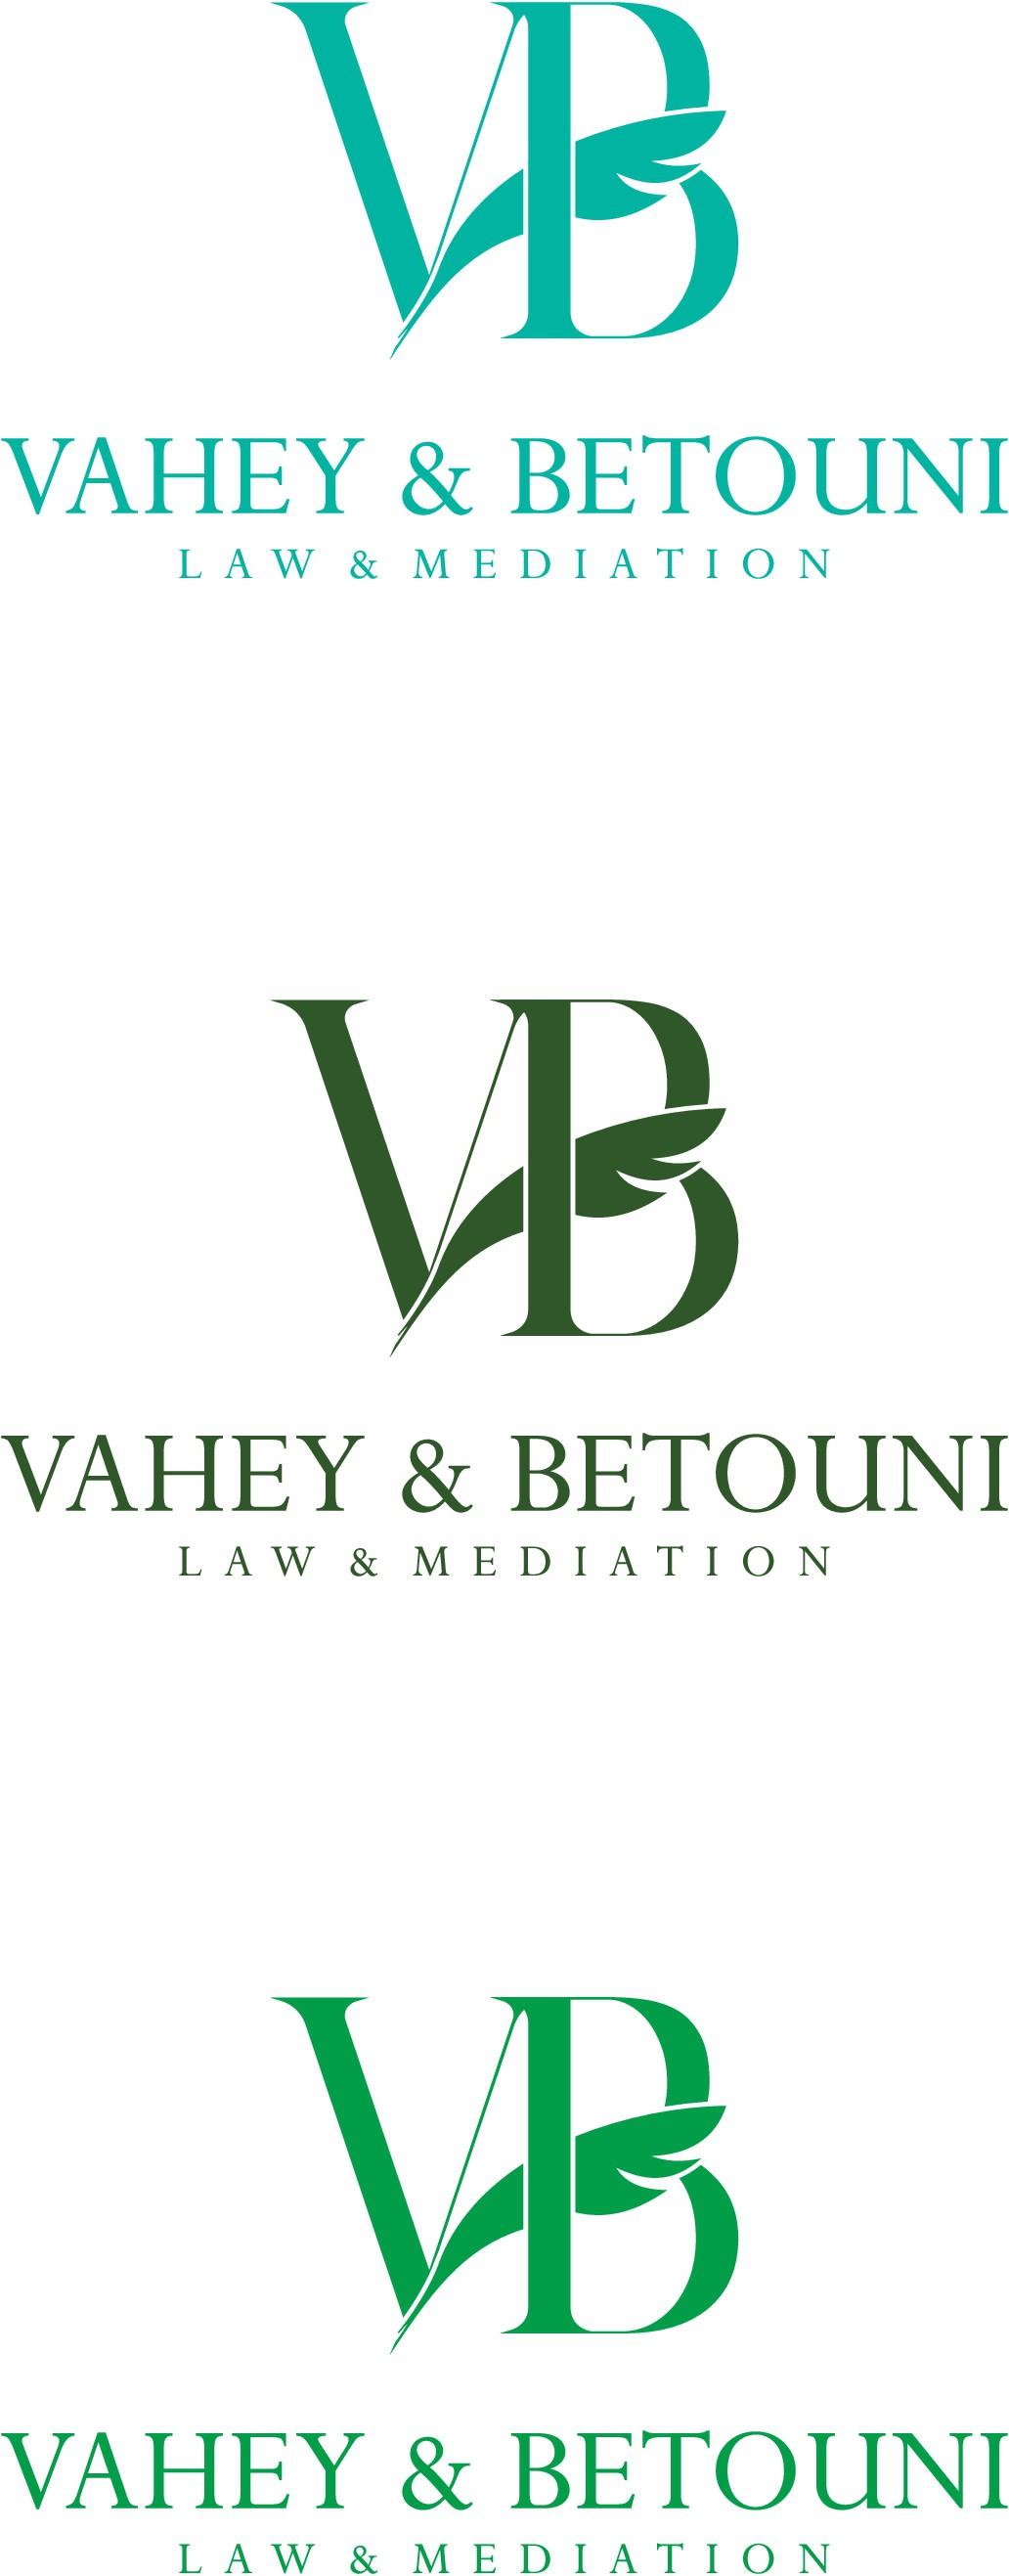 Women Owned Family Law Firm Logo Design